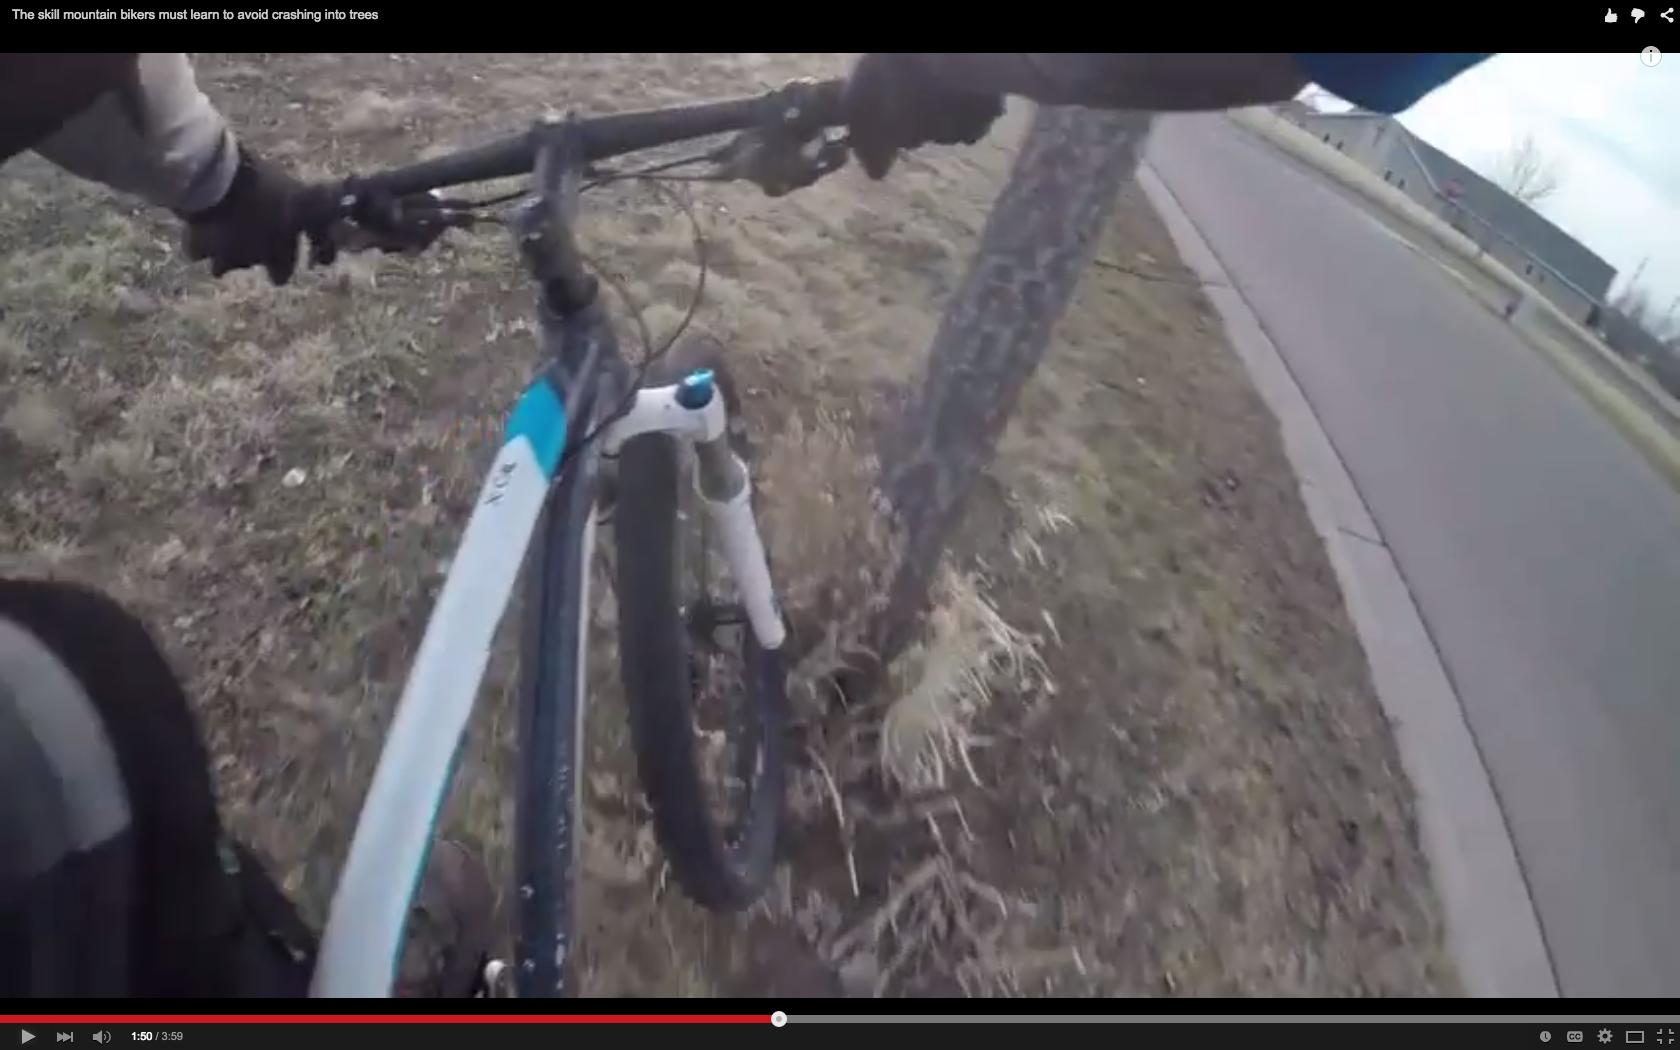 Screen Cast Video: The Skill Mountain Bikers Must Learn to Avoid Crashing into Trees - Singletracks Mountain Bike News